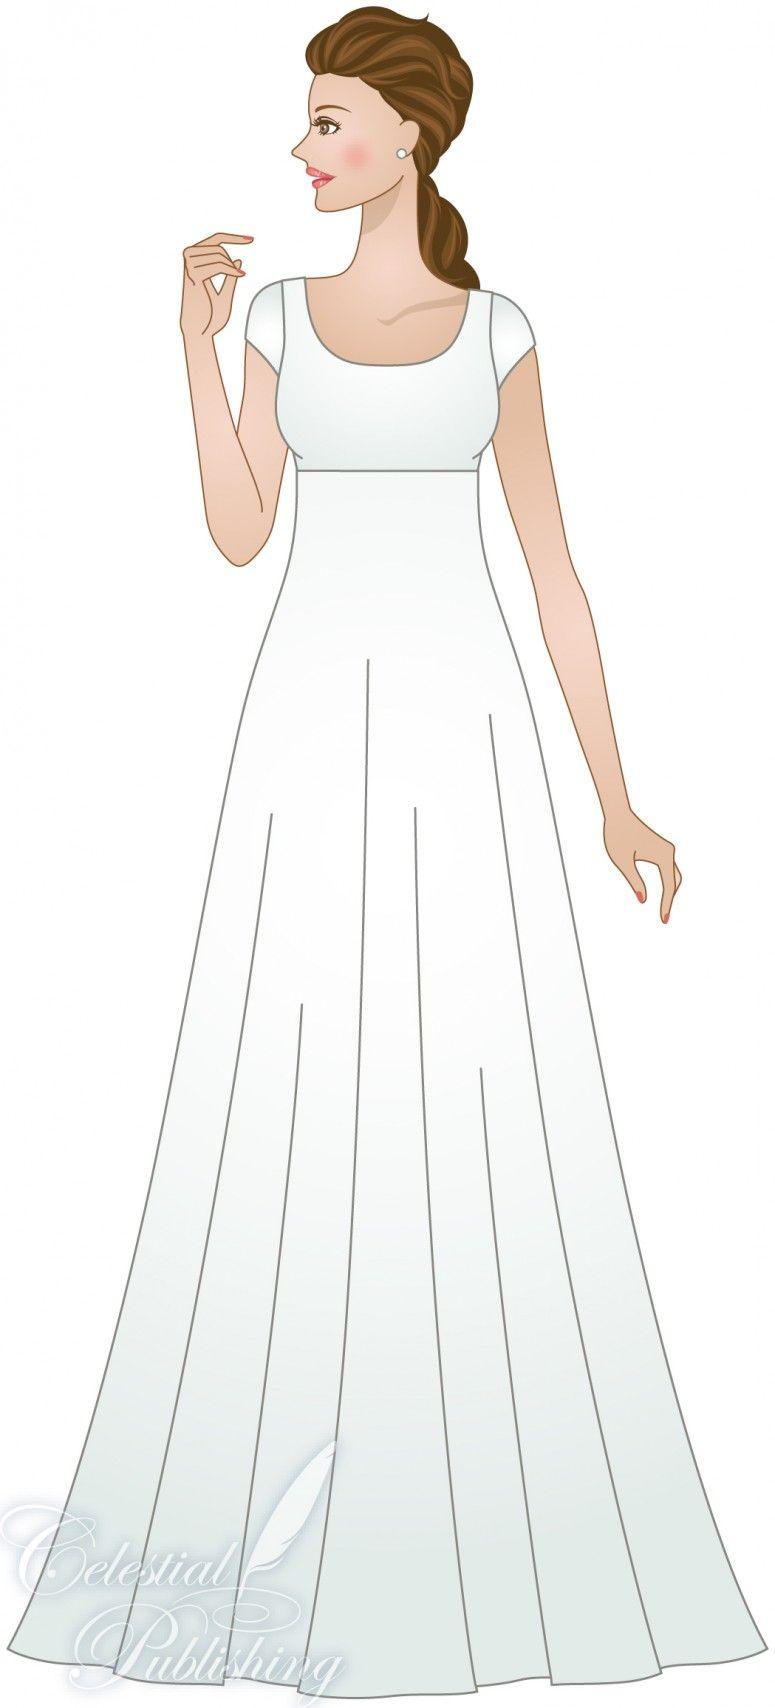 Modest Wedding Dresses, LDS temple weddings, WeddingLDS.com's signature bride modeling Empire Waistline